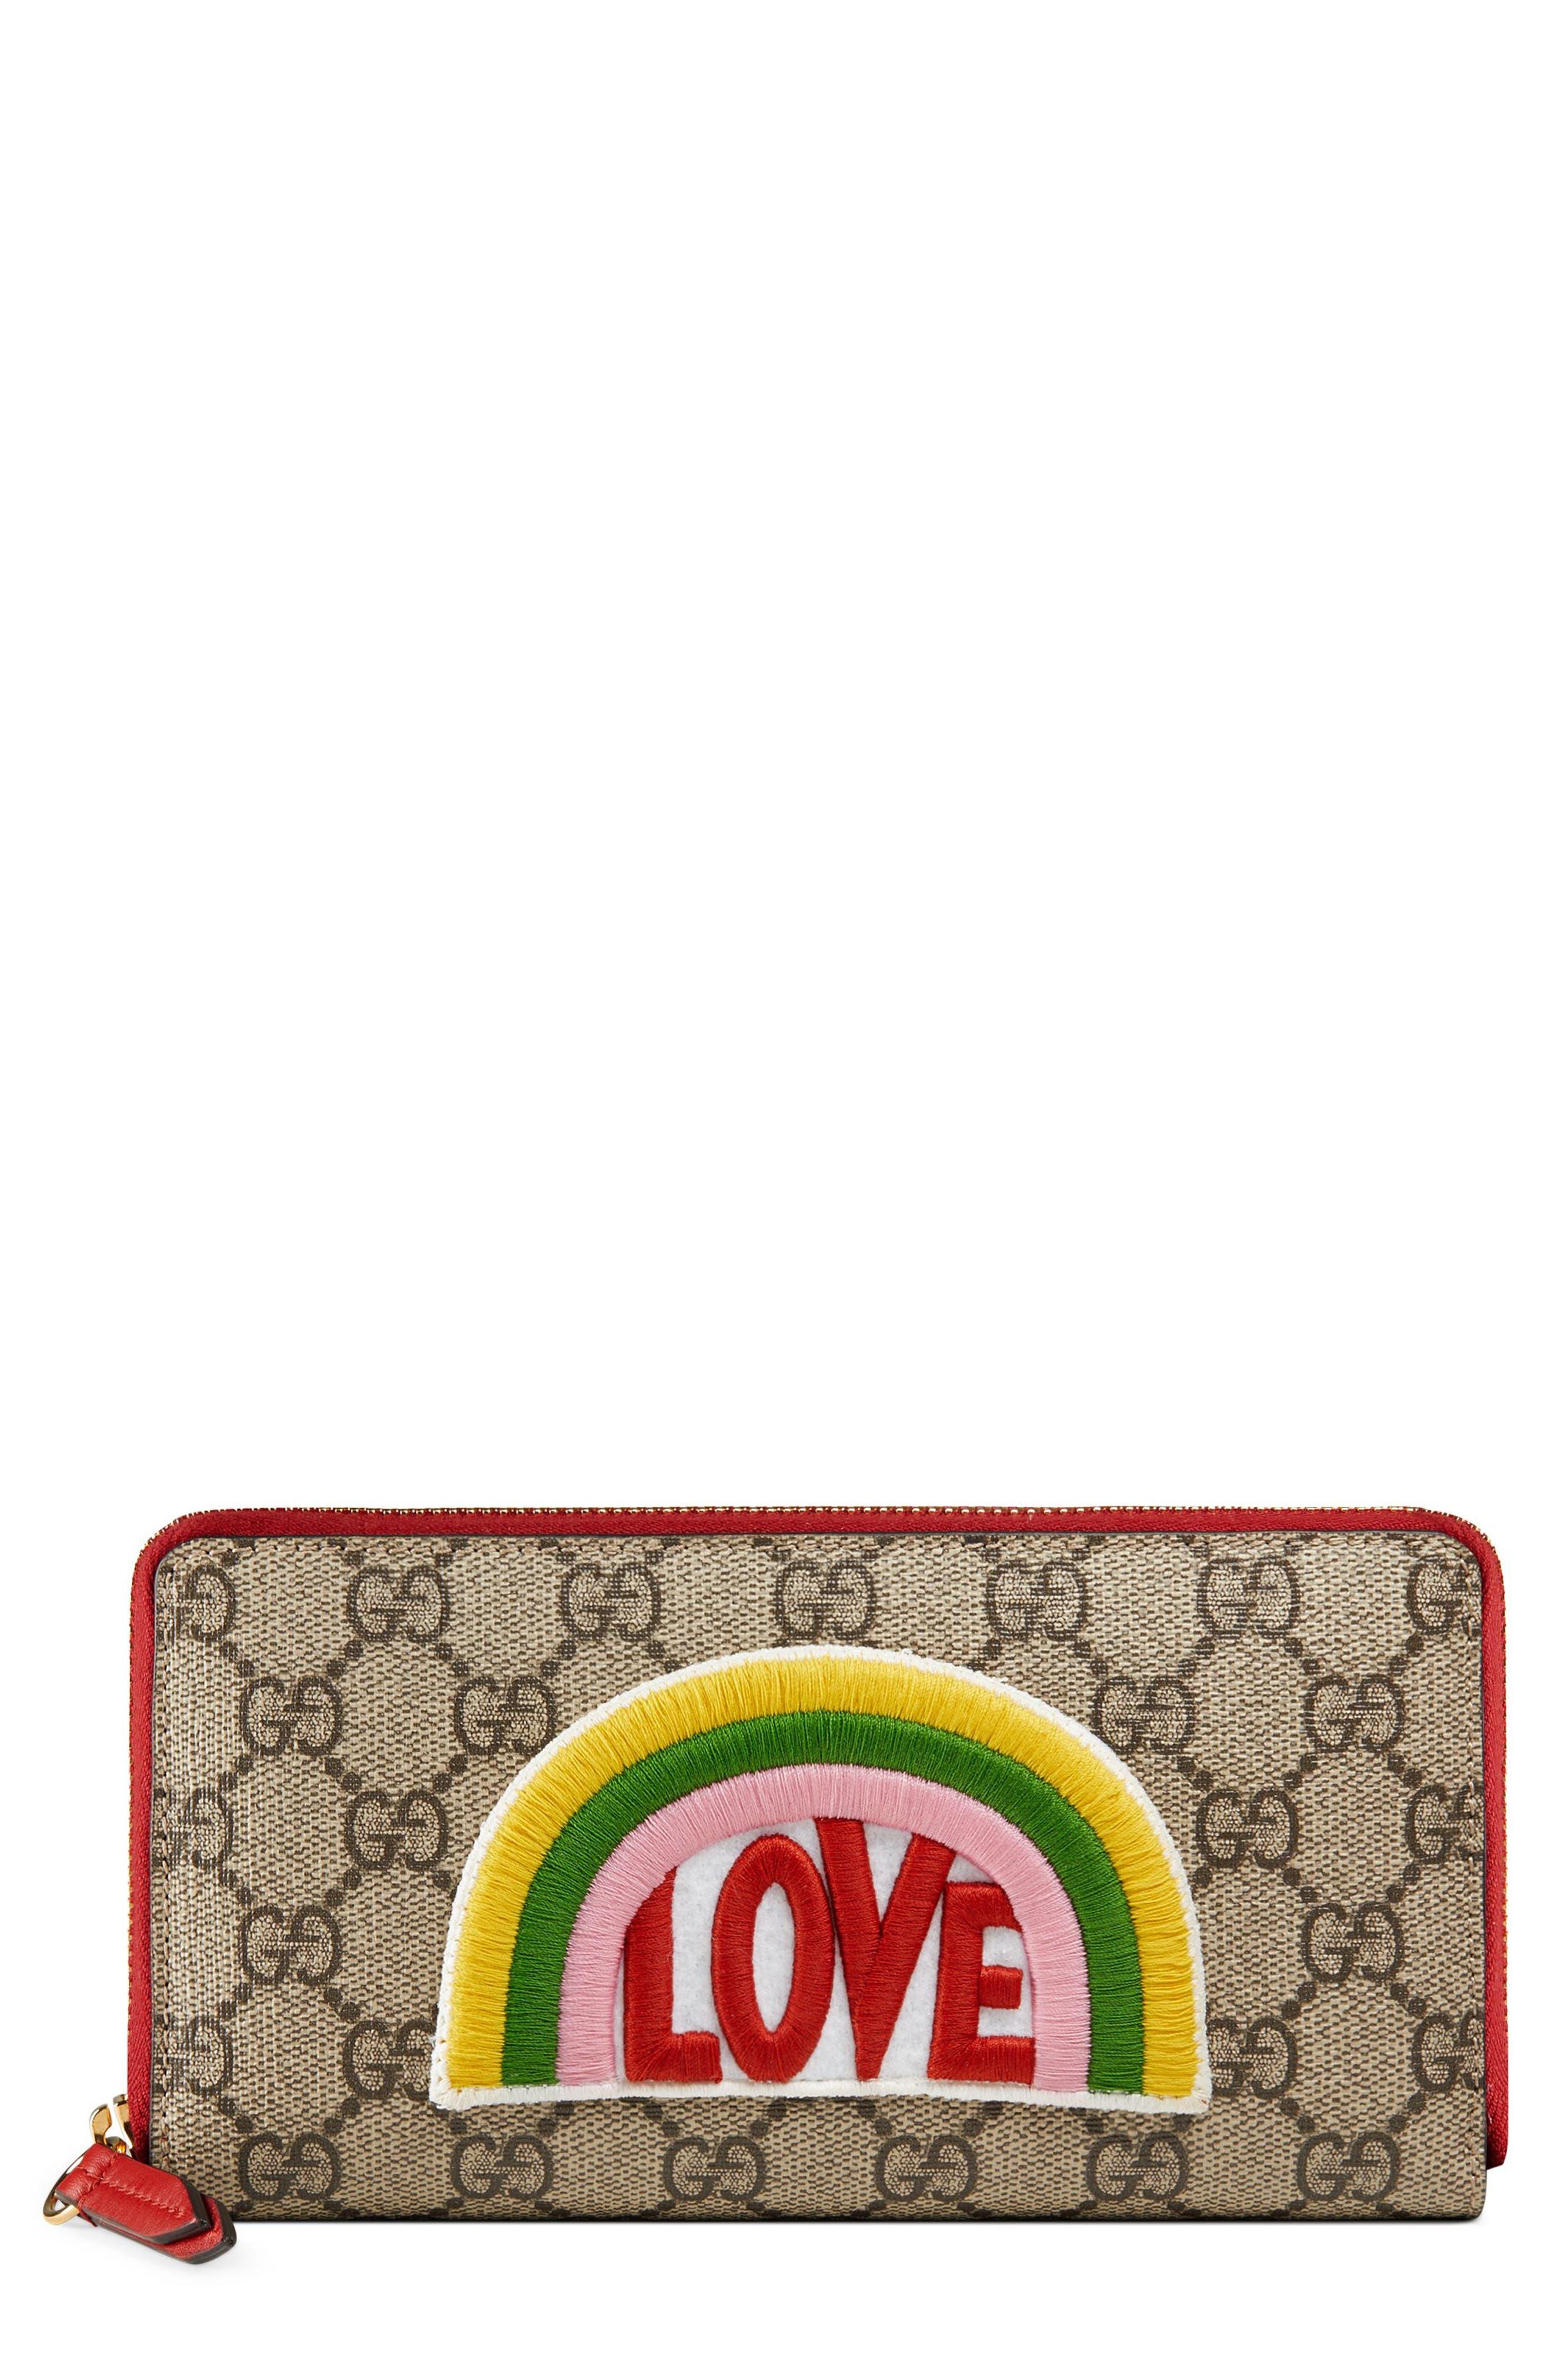 Gucci Embroidered Love Patch GG Supreme Zip Around Wallet